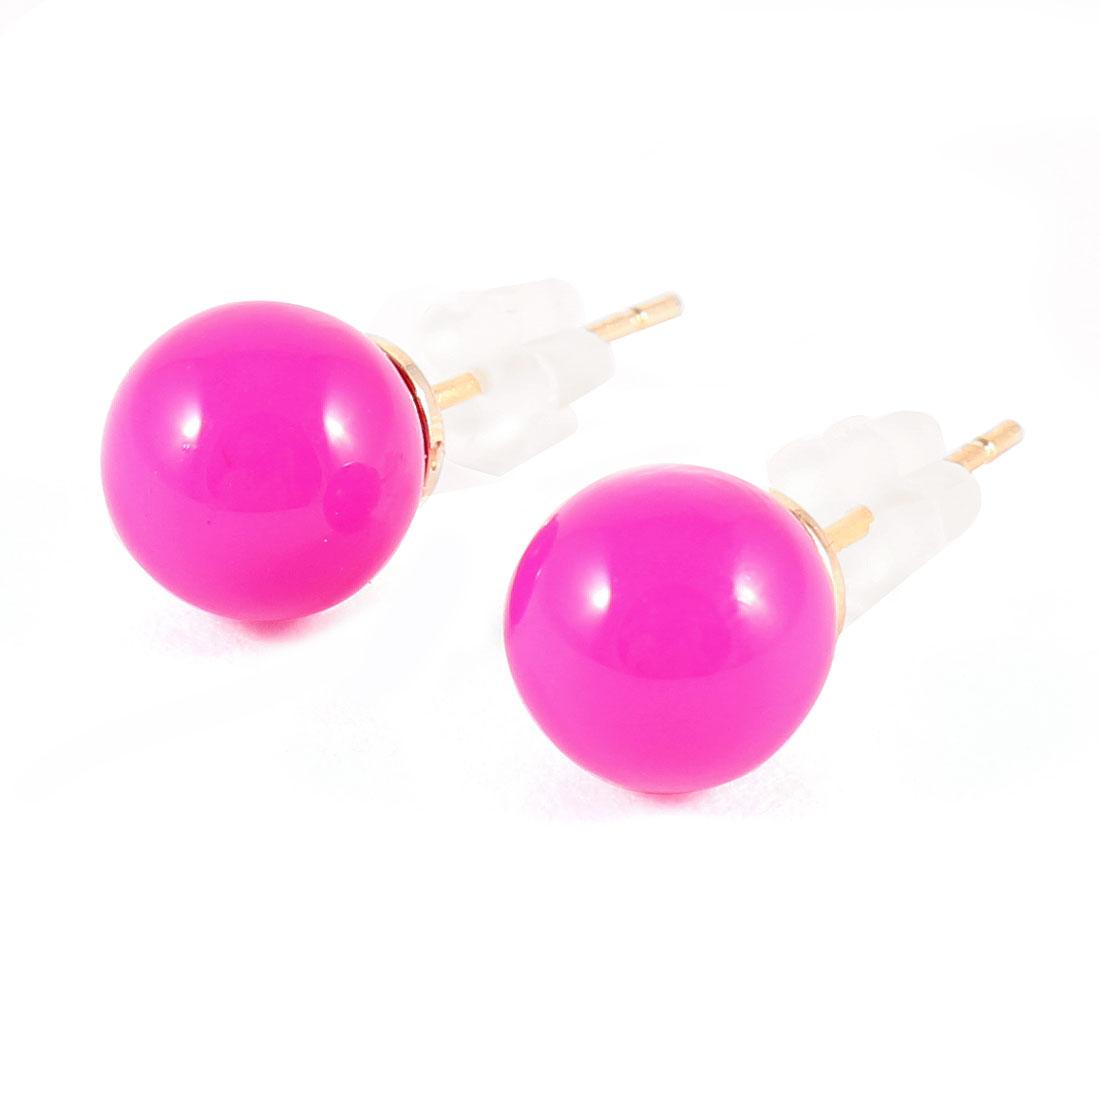 Pair Fuchsia Plastic Ball Shaped Bead Decor Stud Earrings